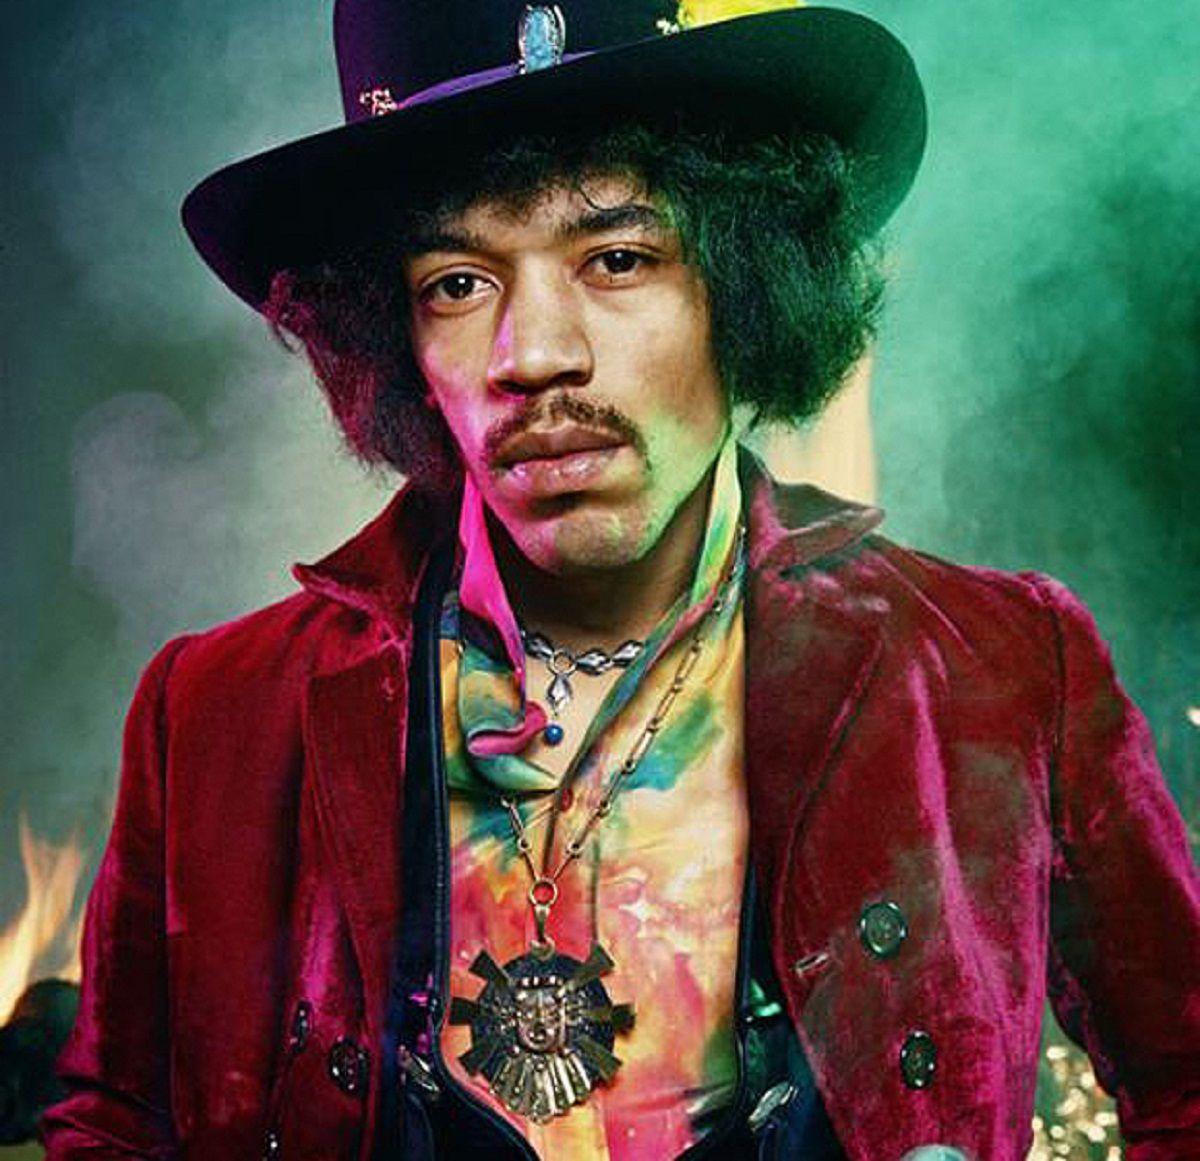 13. Jimi Hendrix - $7 million